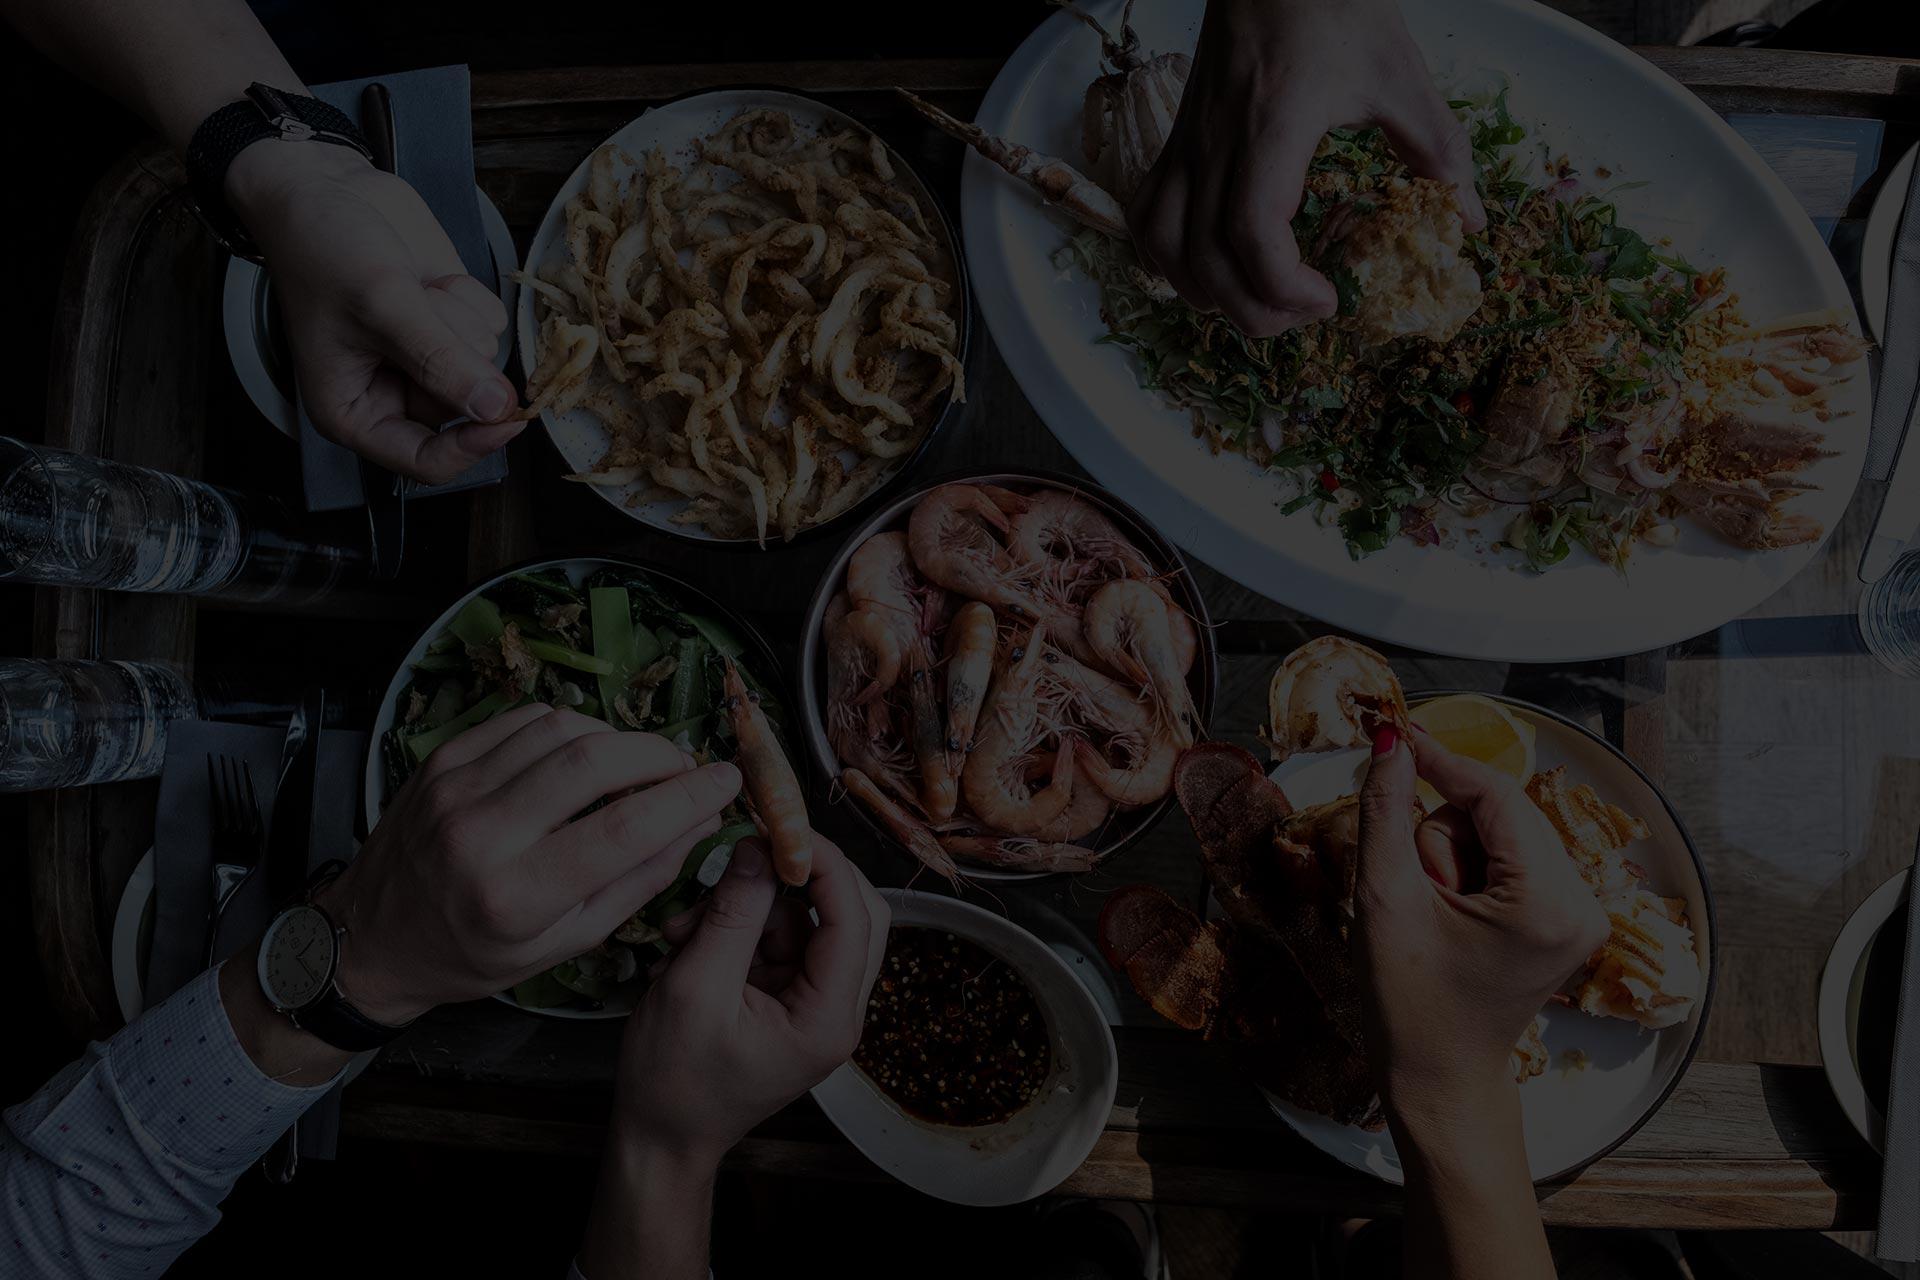 #TasteHKG 2.0 and TasteTPE 2018 Follow the Chinese Restaurant Awards